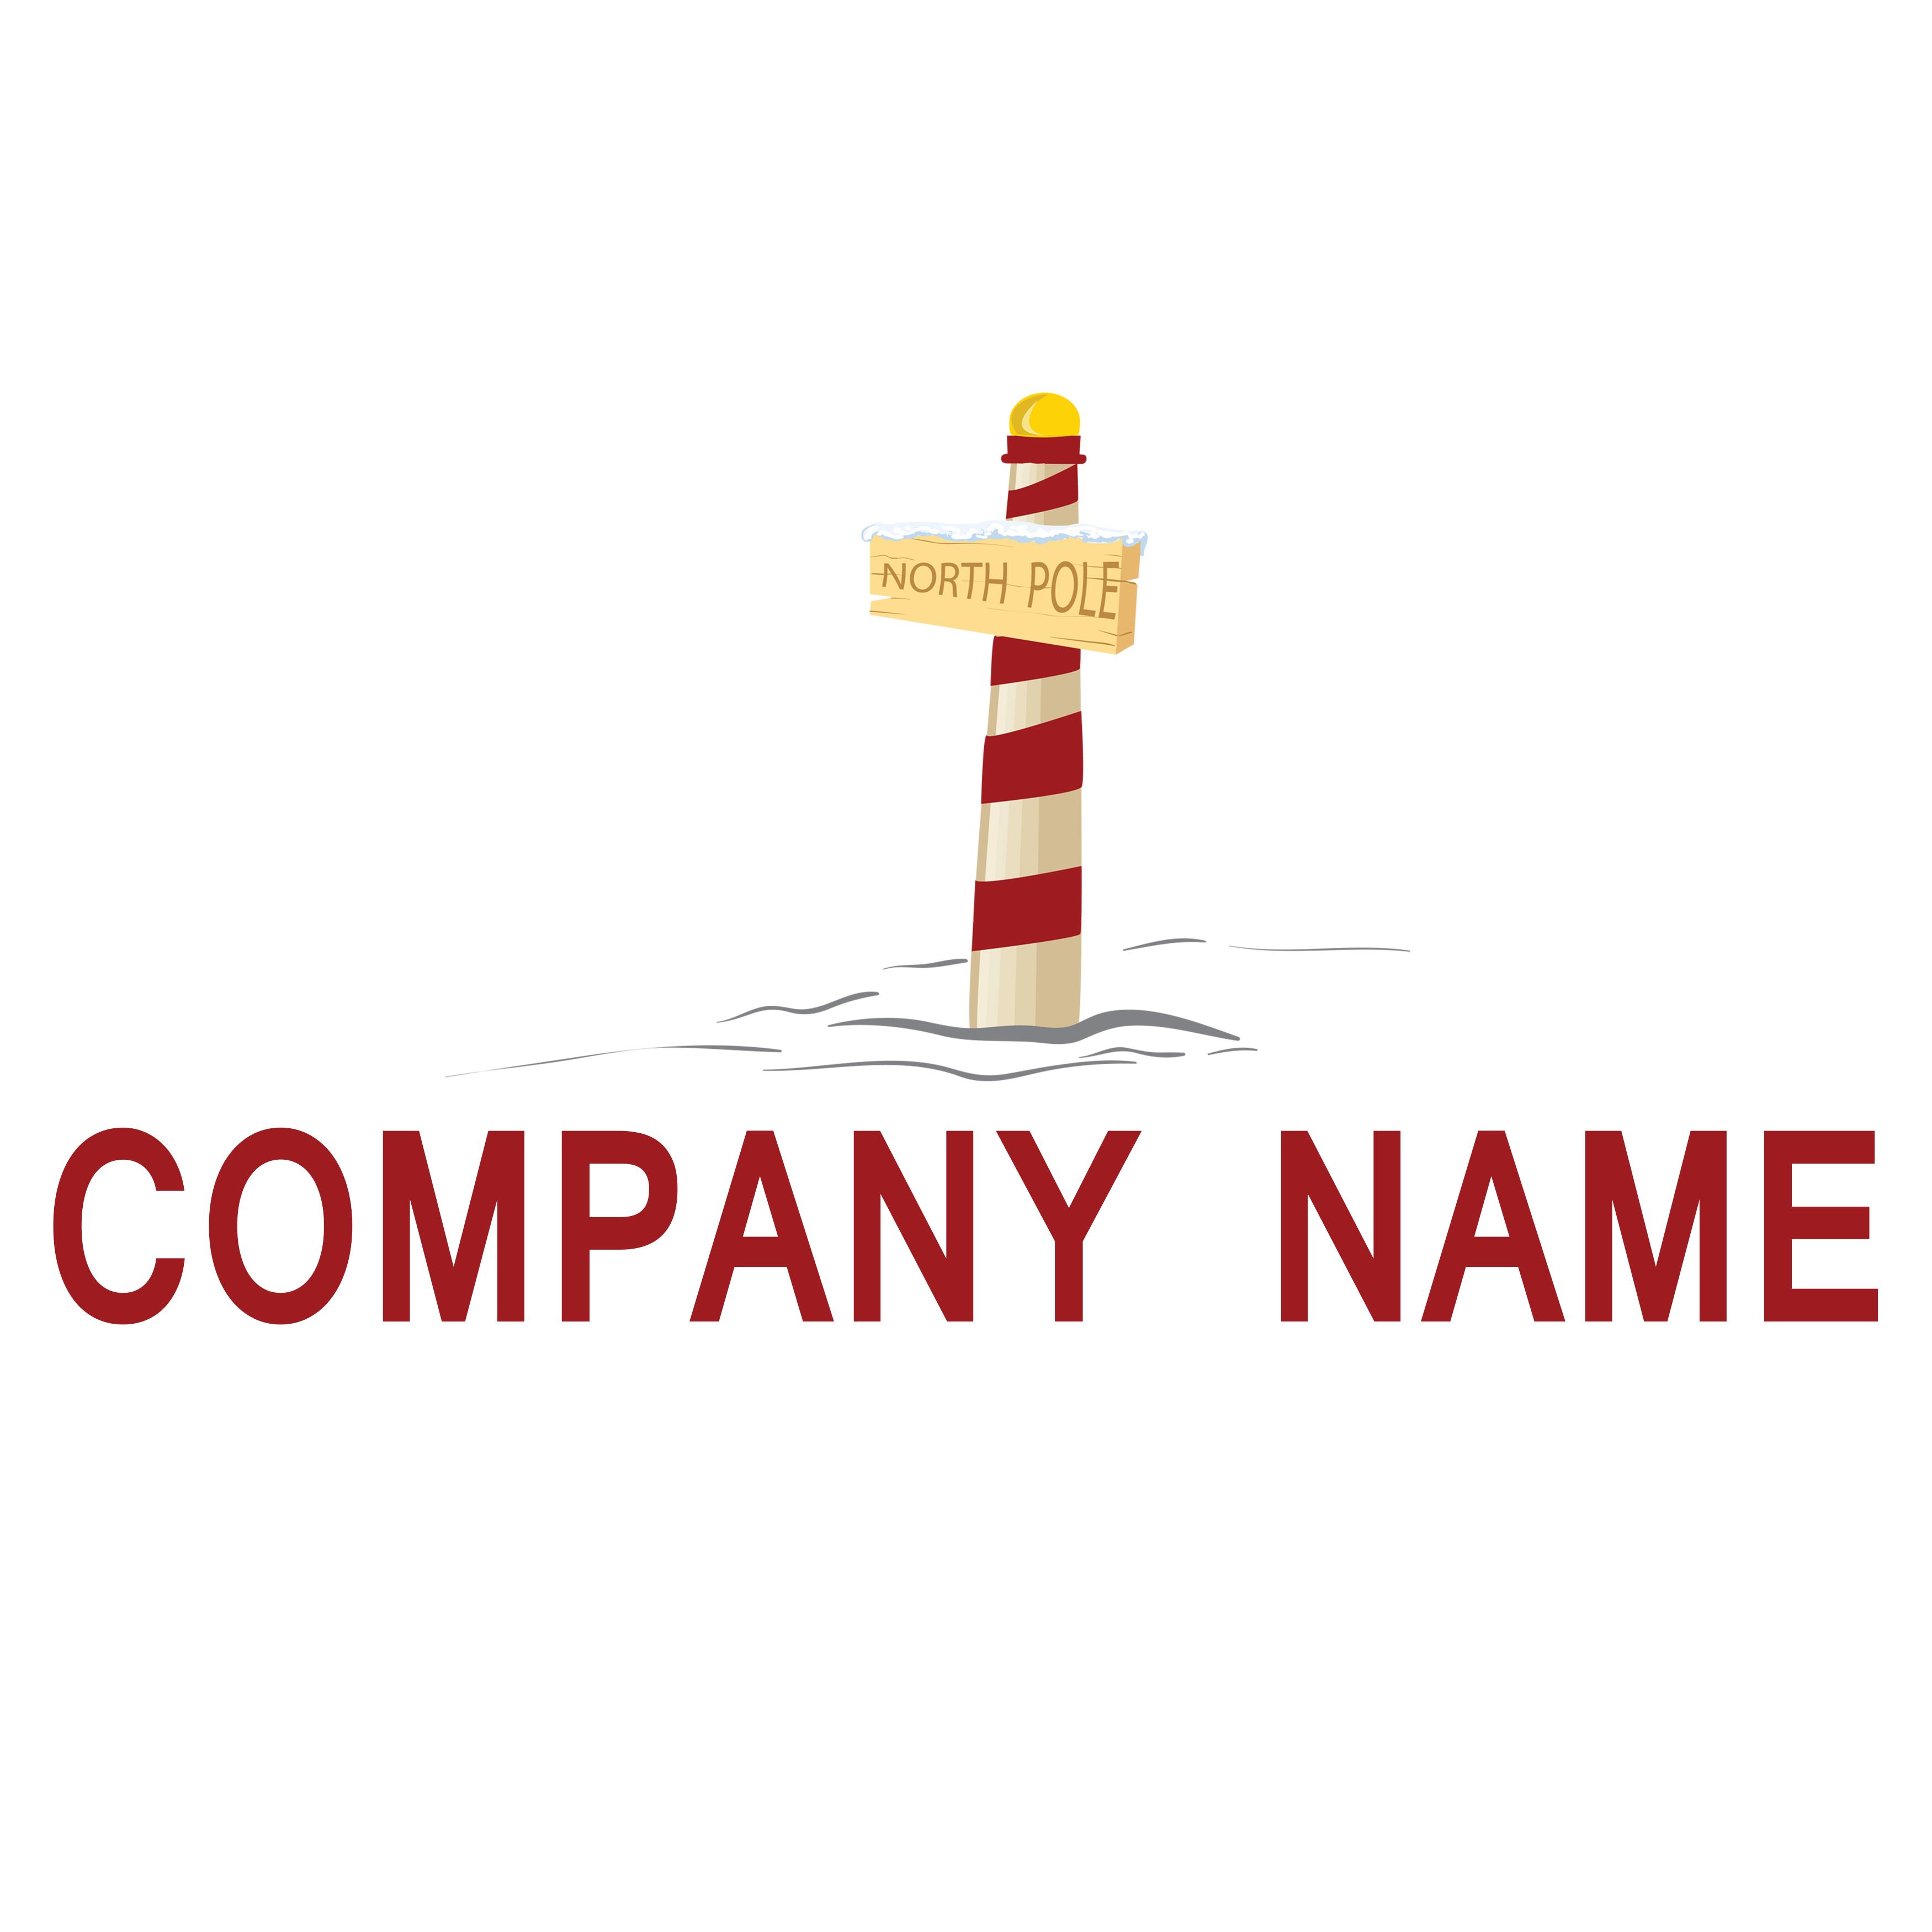 NorthPole logo